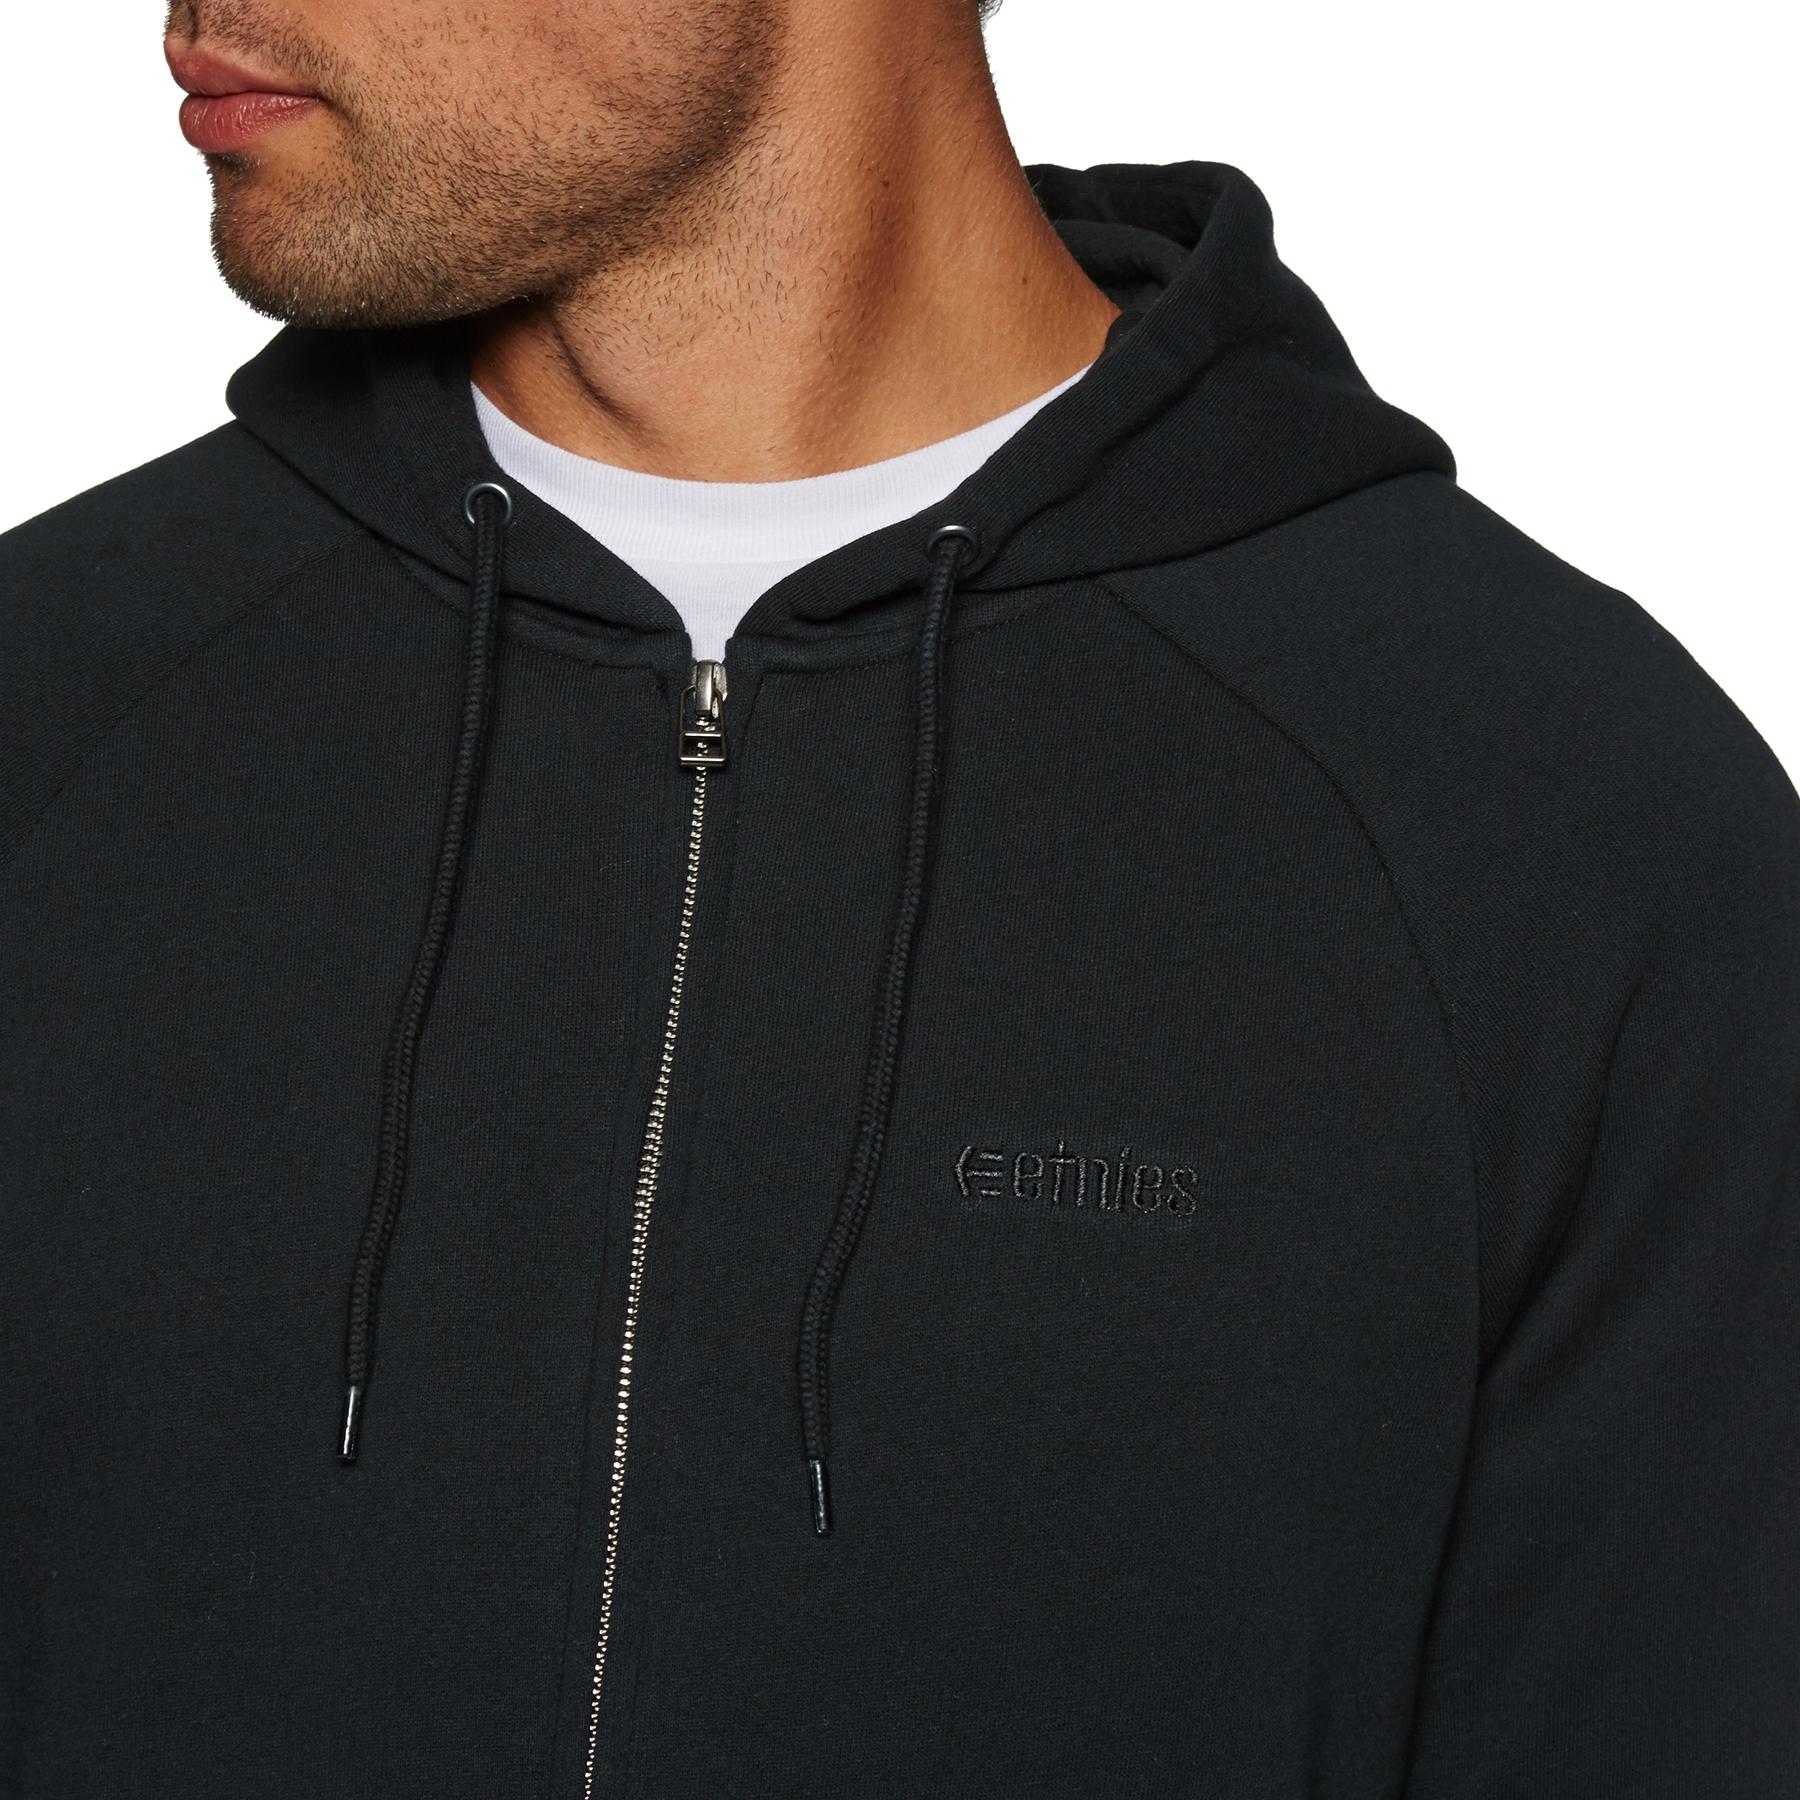 Etnies Core Icon Zipped Hoody in Black Grey